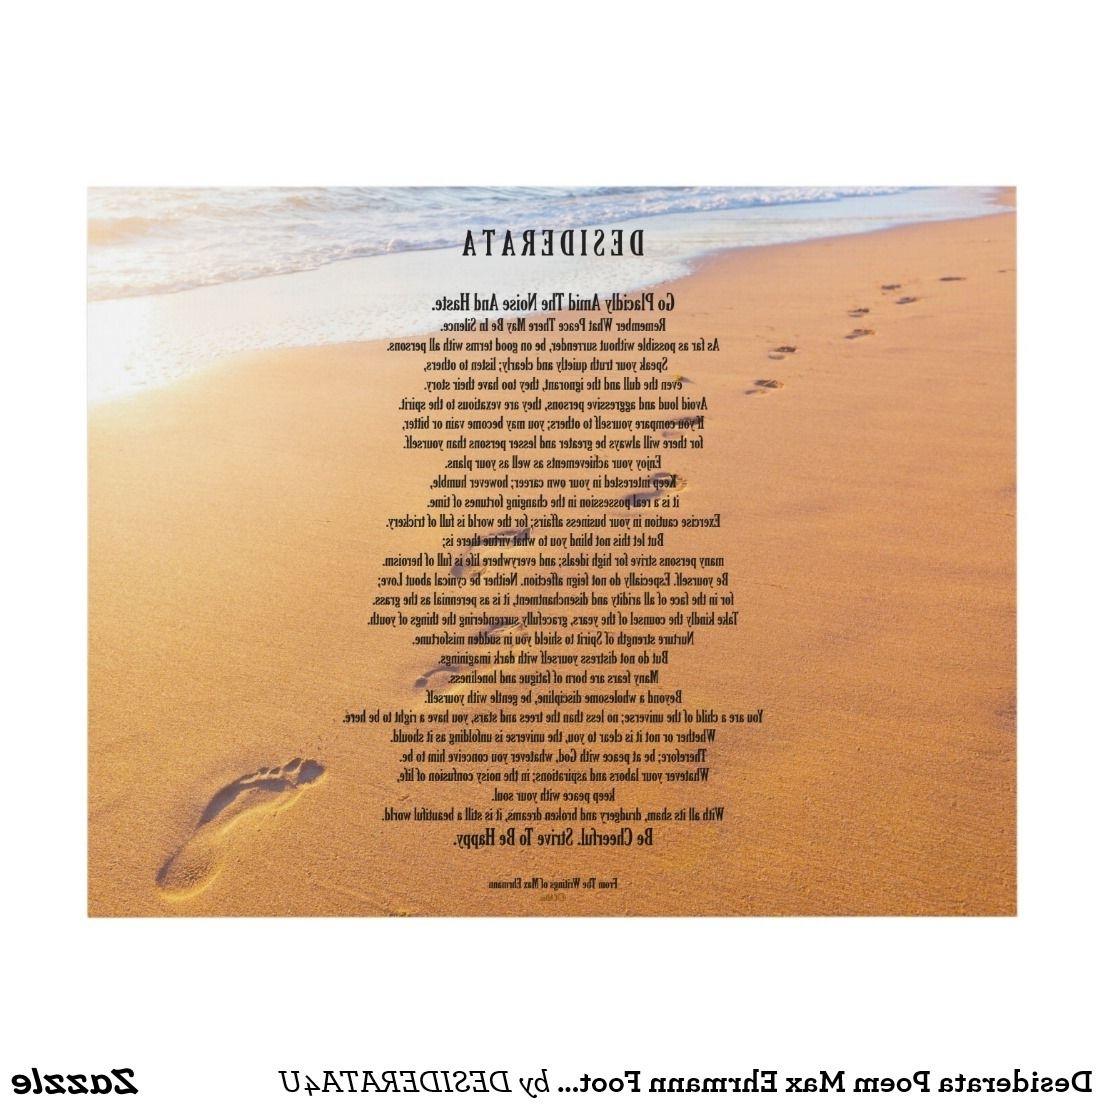 Desiderata Poem Max Ehrmann Footprints In The Sand Panel Wall Art Inside Most Current Footprints In The Sand Wall Art (Gallery 11 of 15)